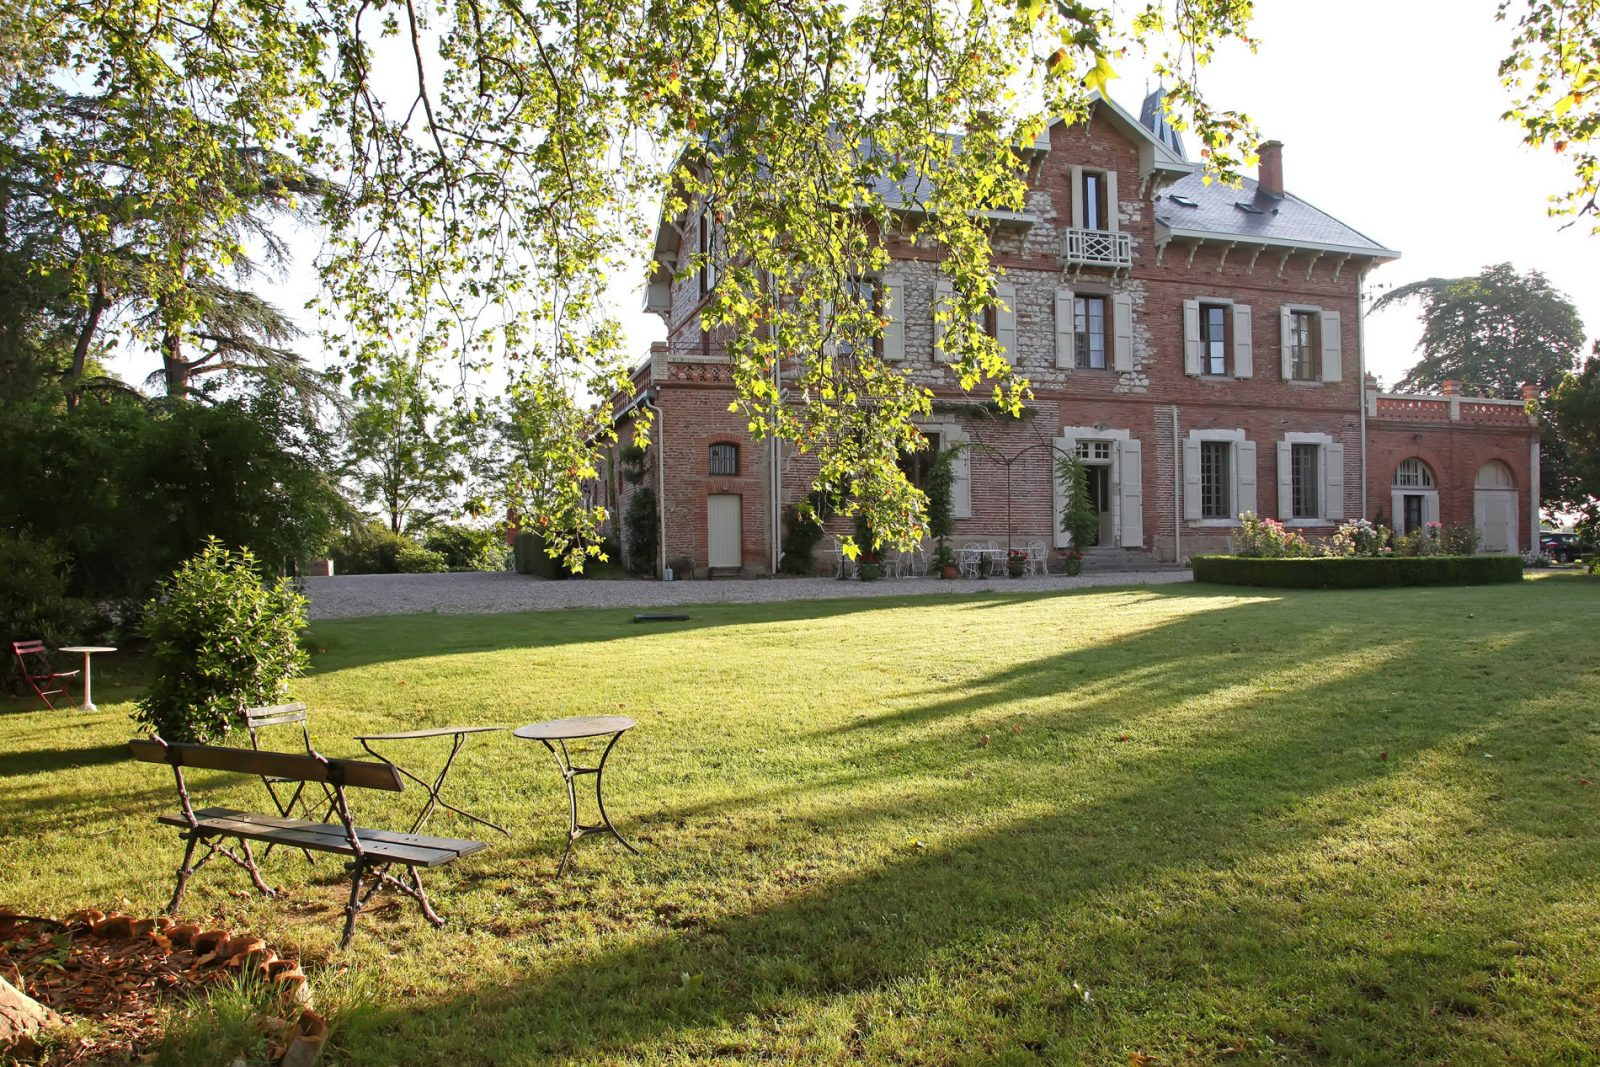 Domaine du Buc Location de Vacances Albi – Marssac